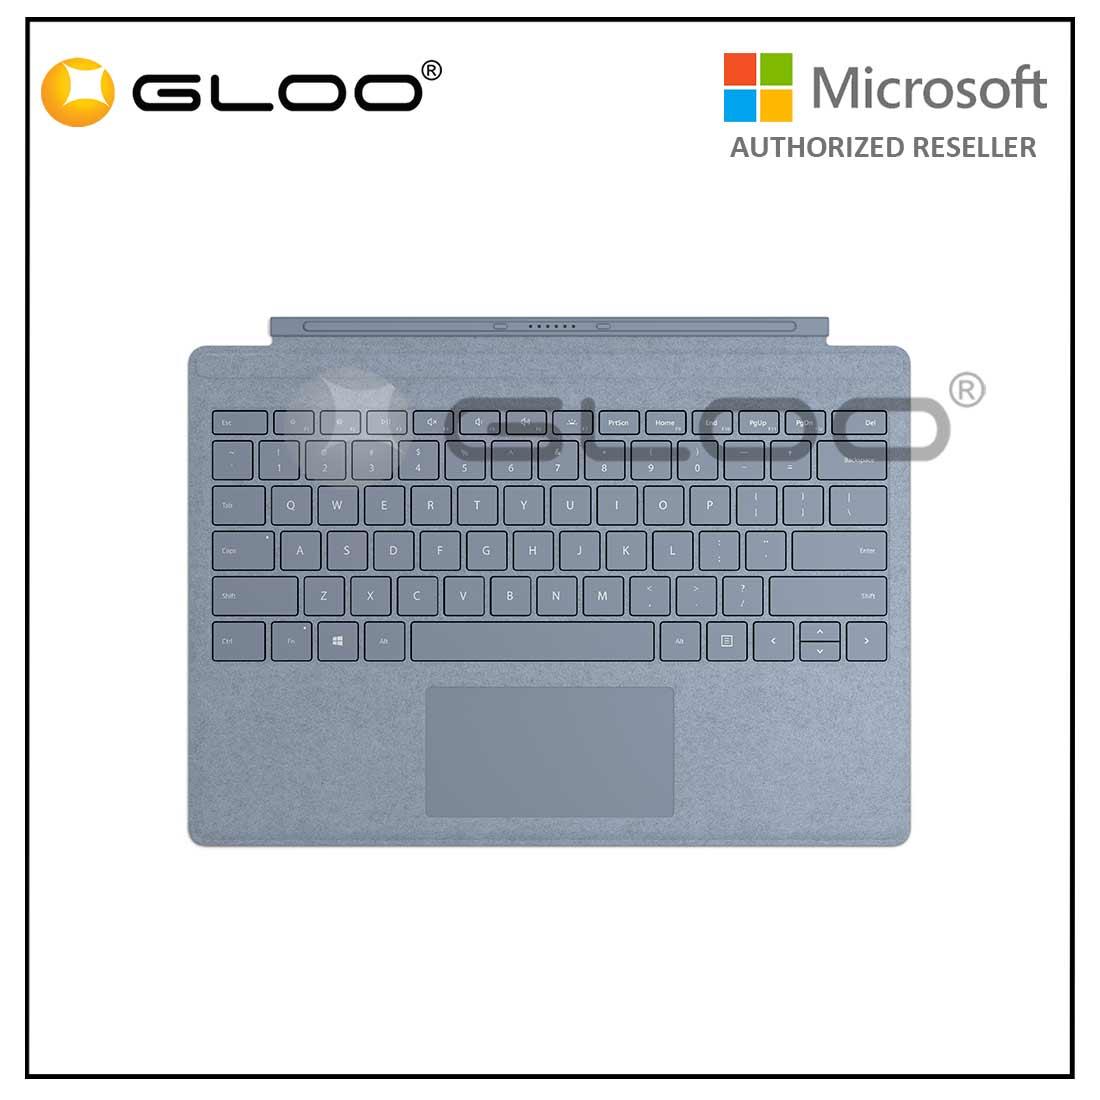 Microsoft Surface Pro Signature Type Cover Ice Blue - FFP-00135 [KBDMSOFFFP0135]